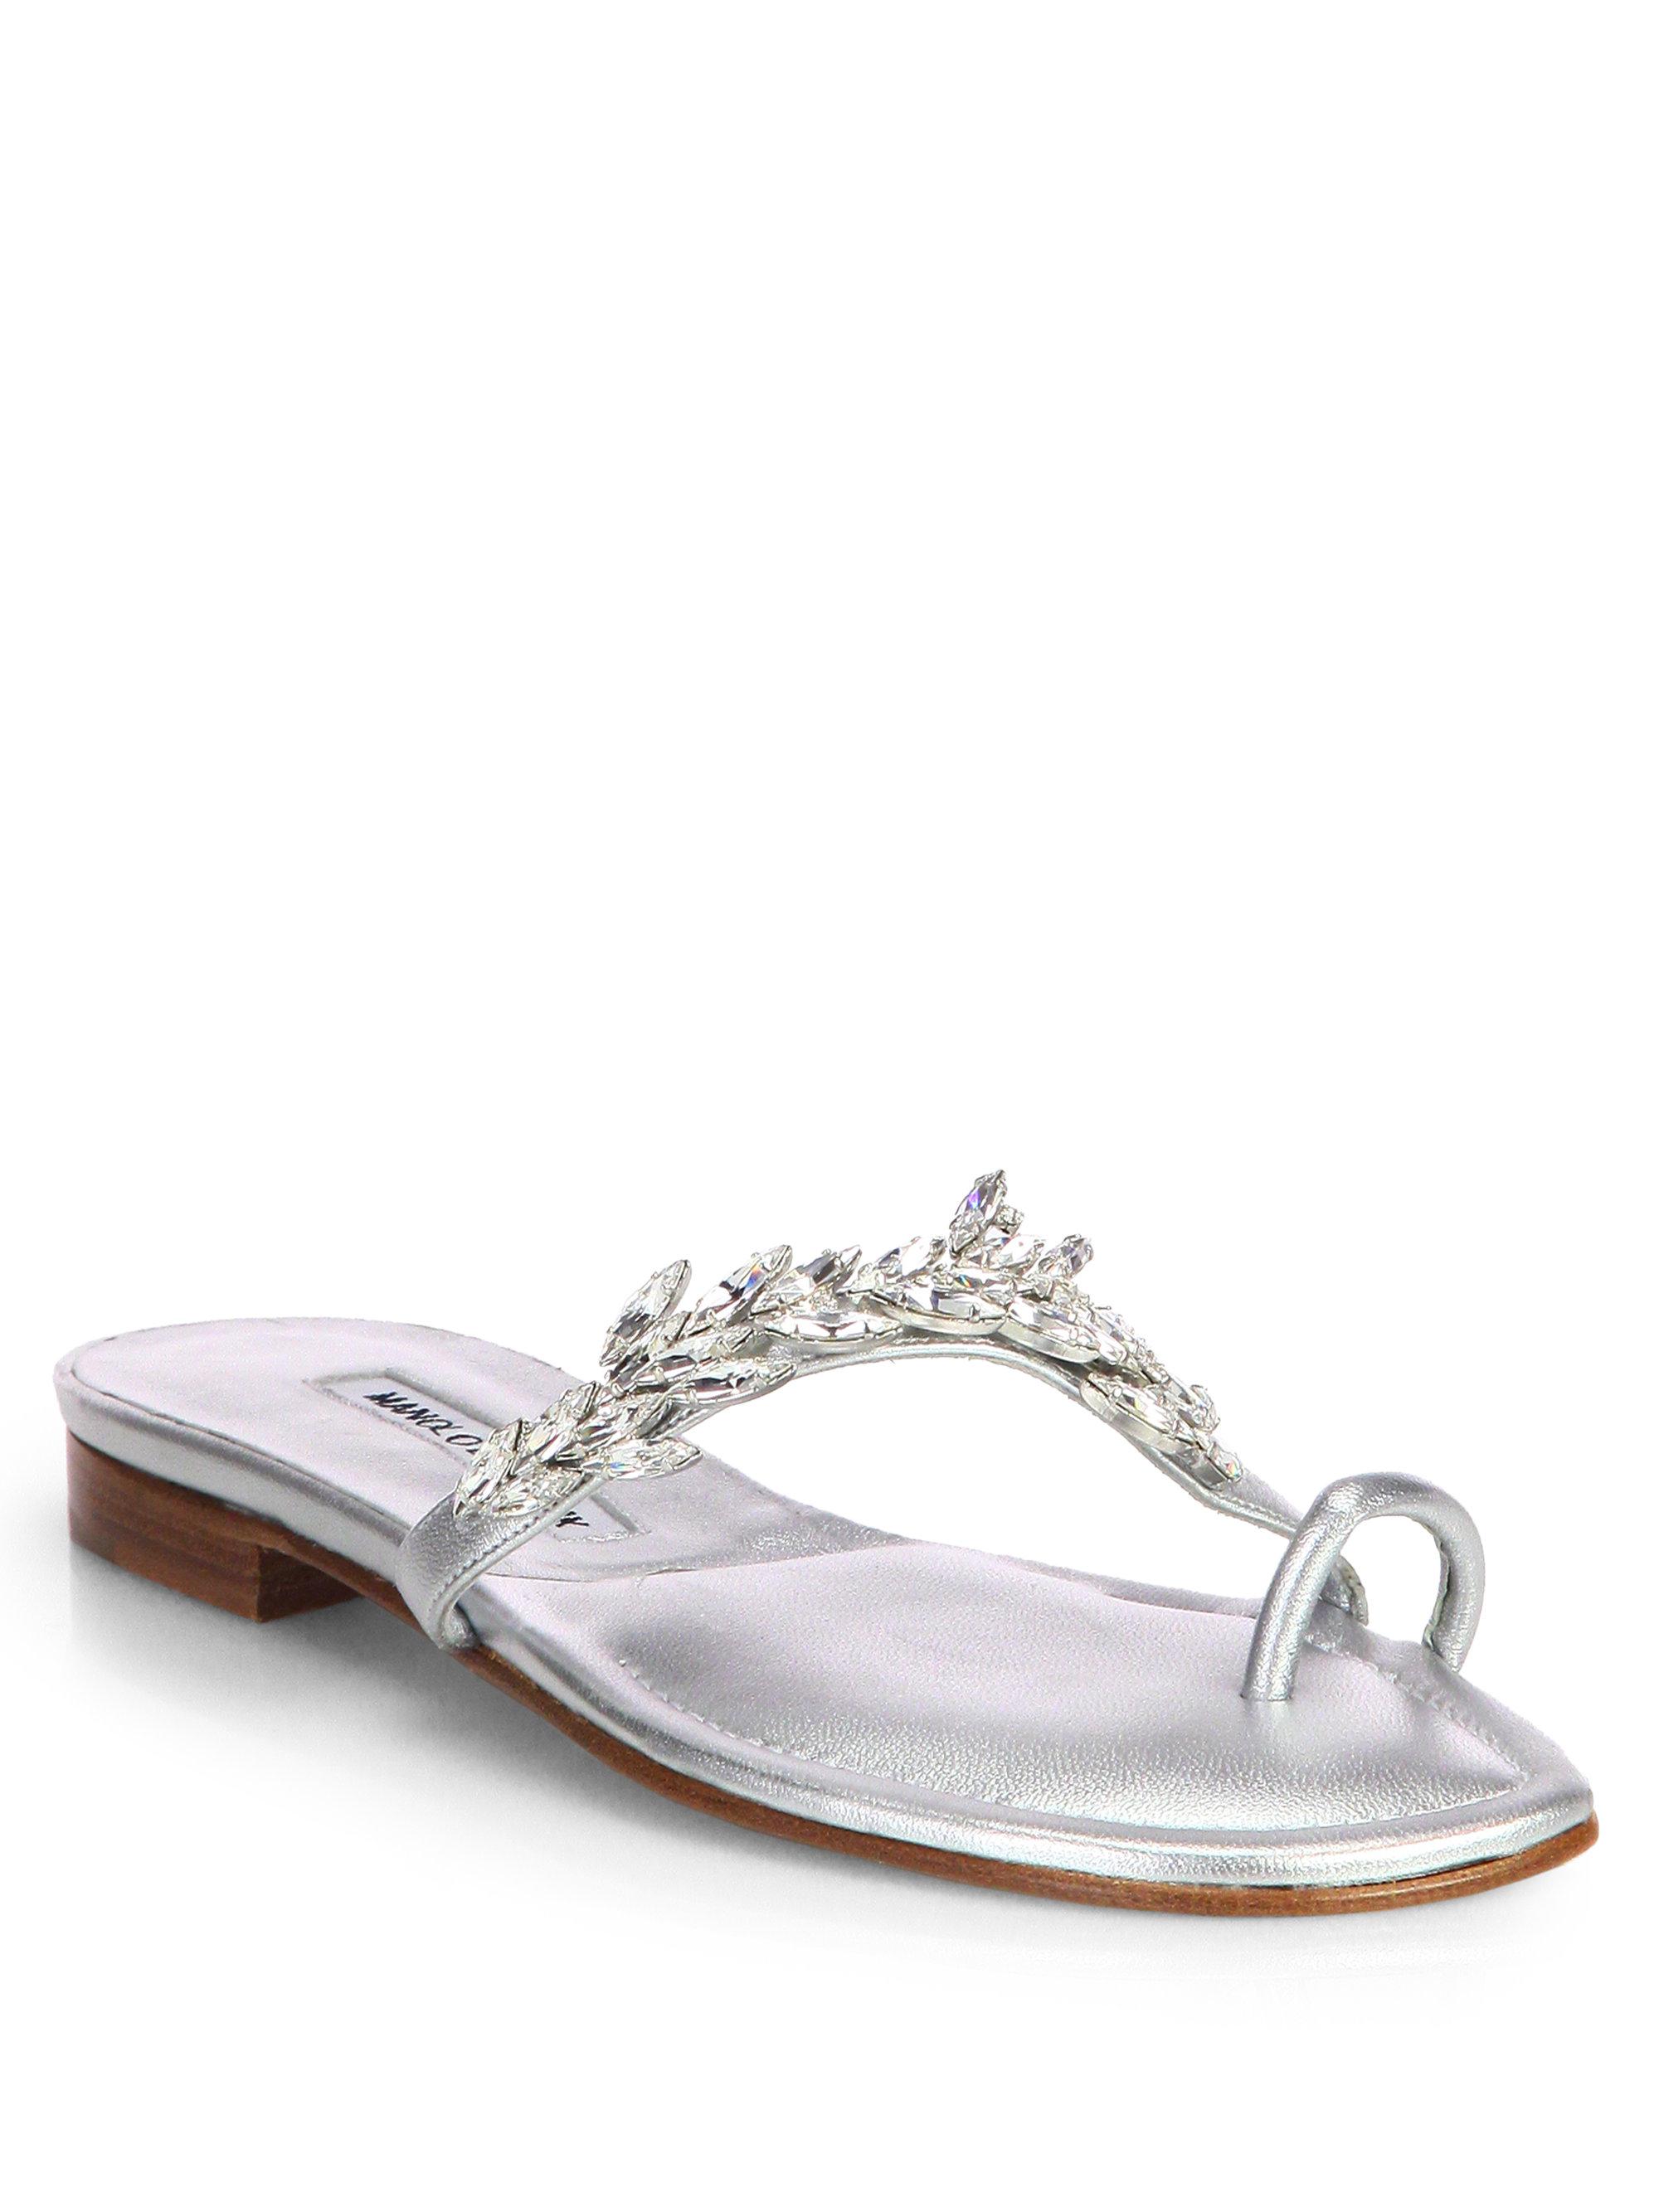 Luxury Slides Shoes